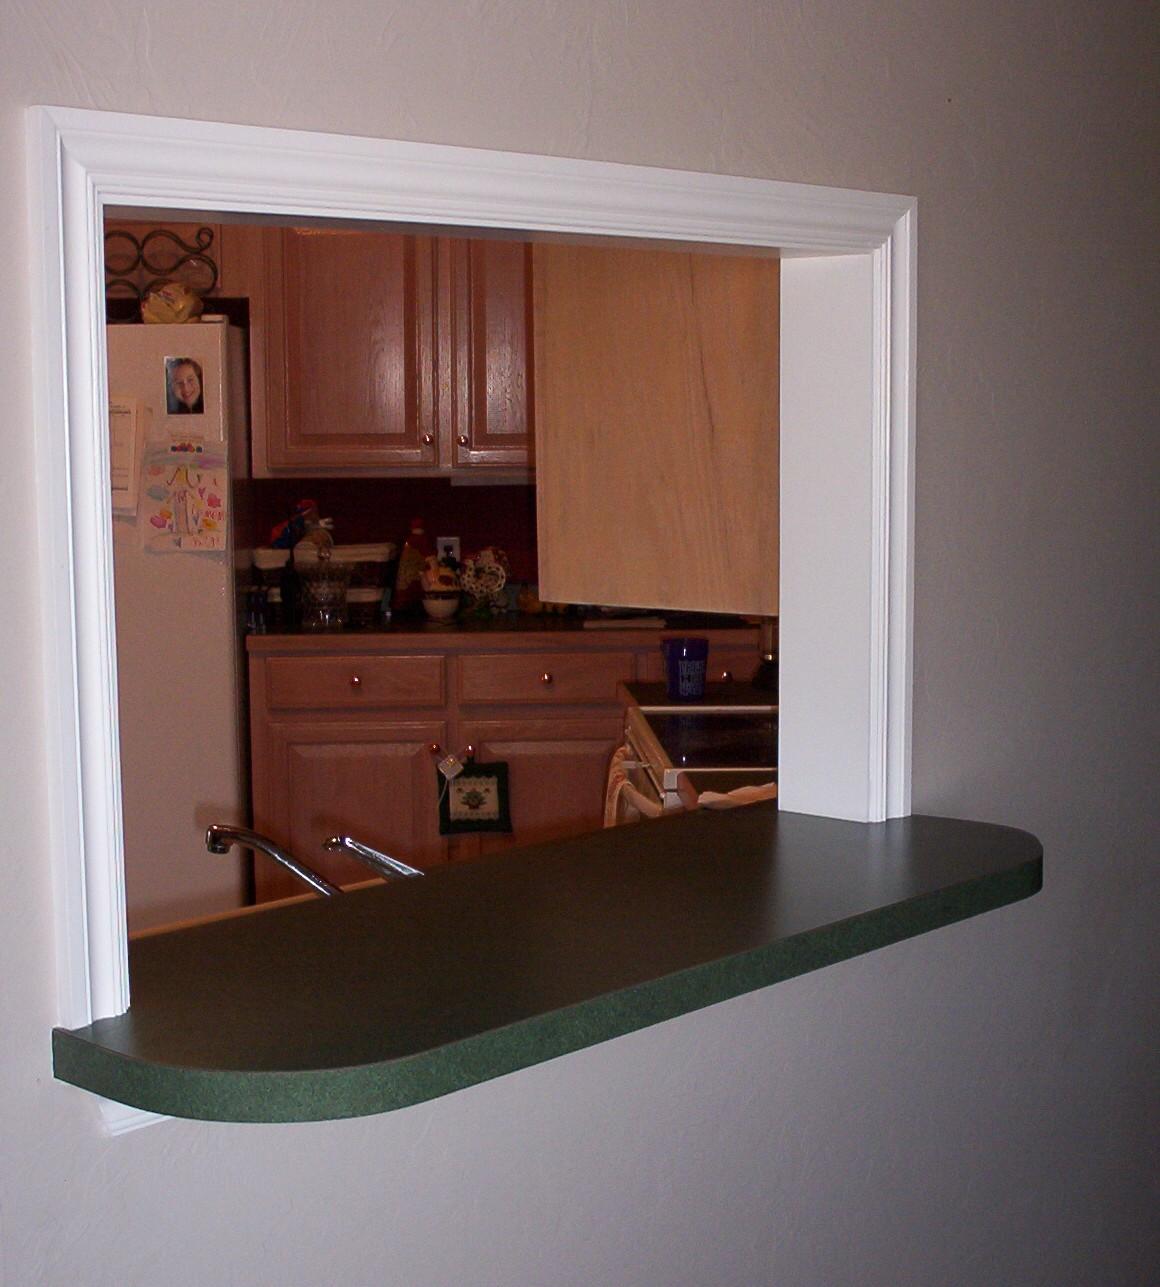 pass through kitchen window backsplash images m andm construction remodel